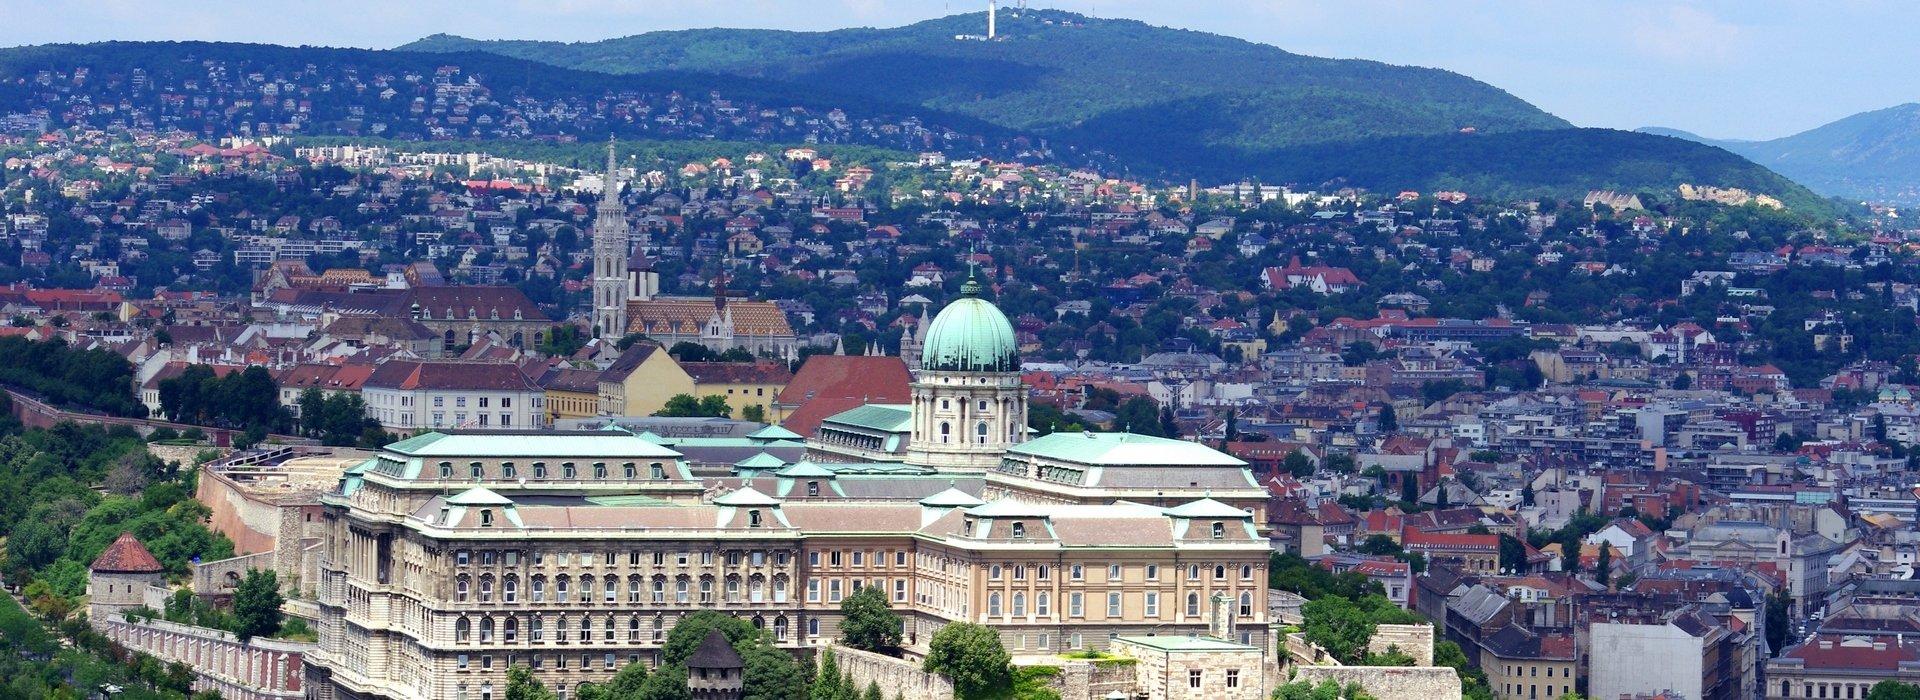 Budapest Világörökségei – Világörökségek Budapesten